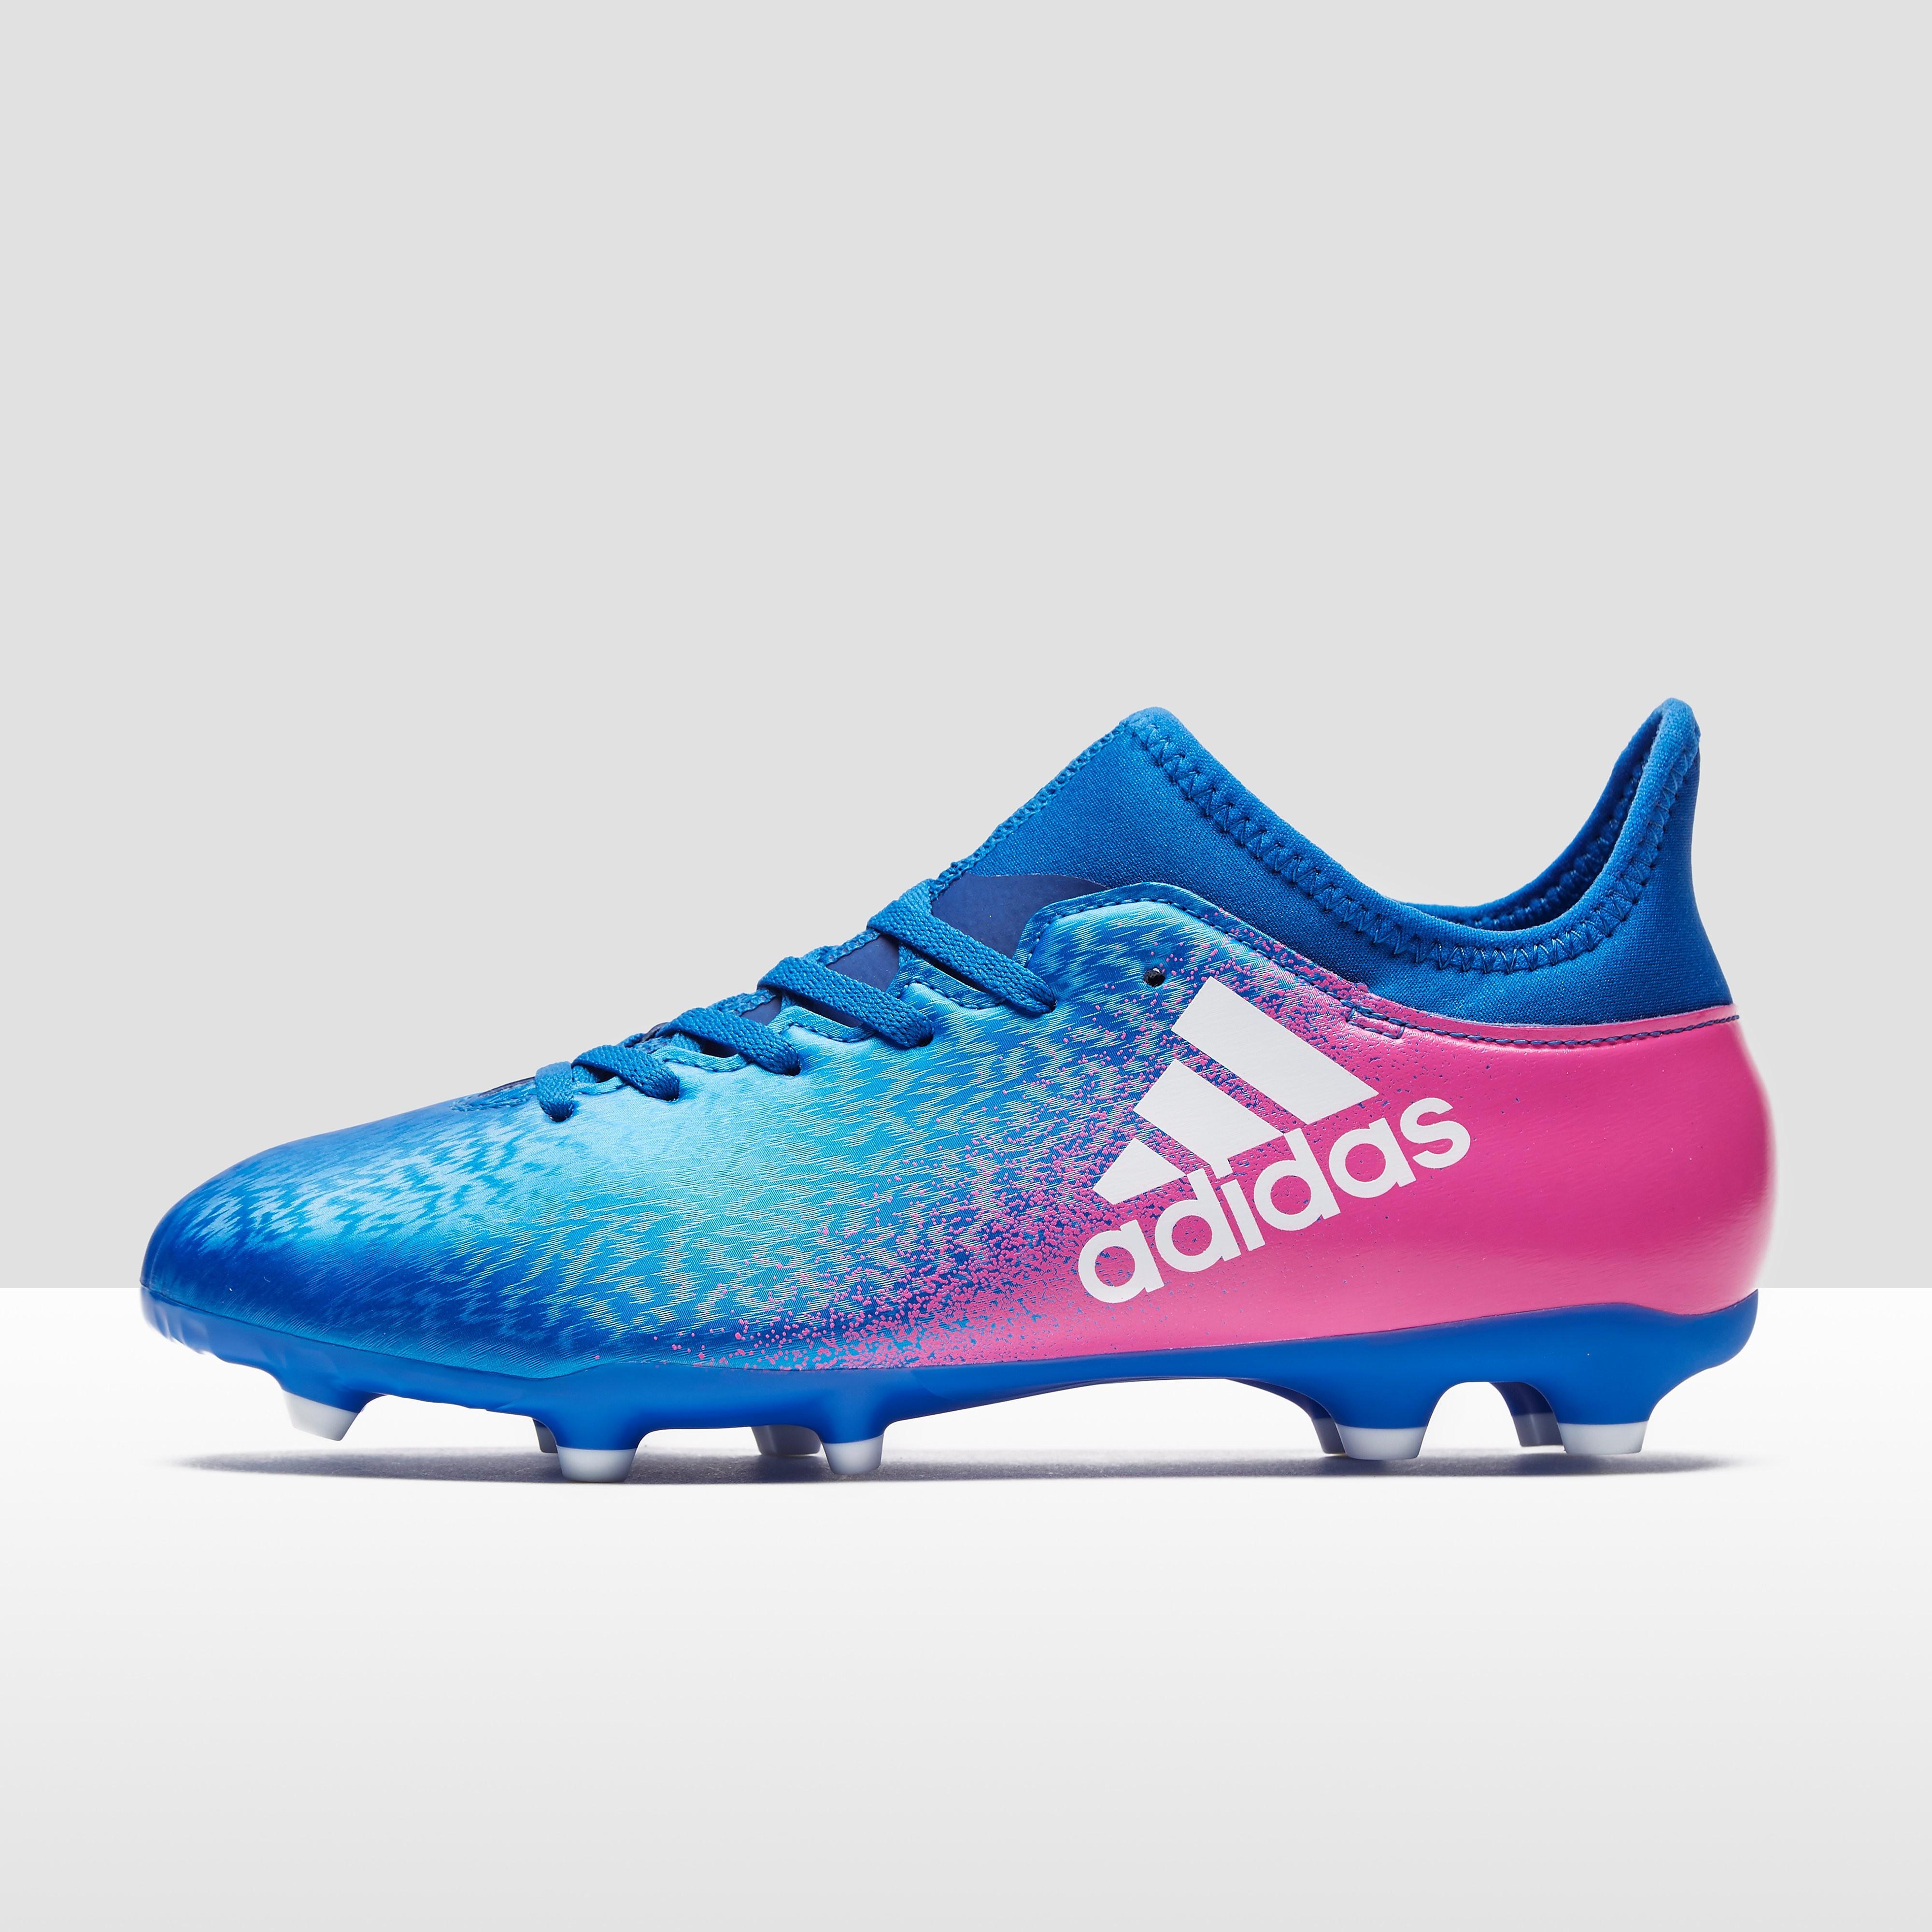 adidas Blue Blast 16.3 Junior Firm Ground Football Boots